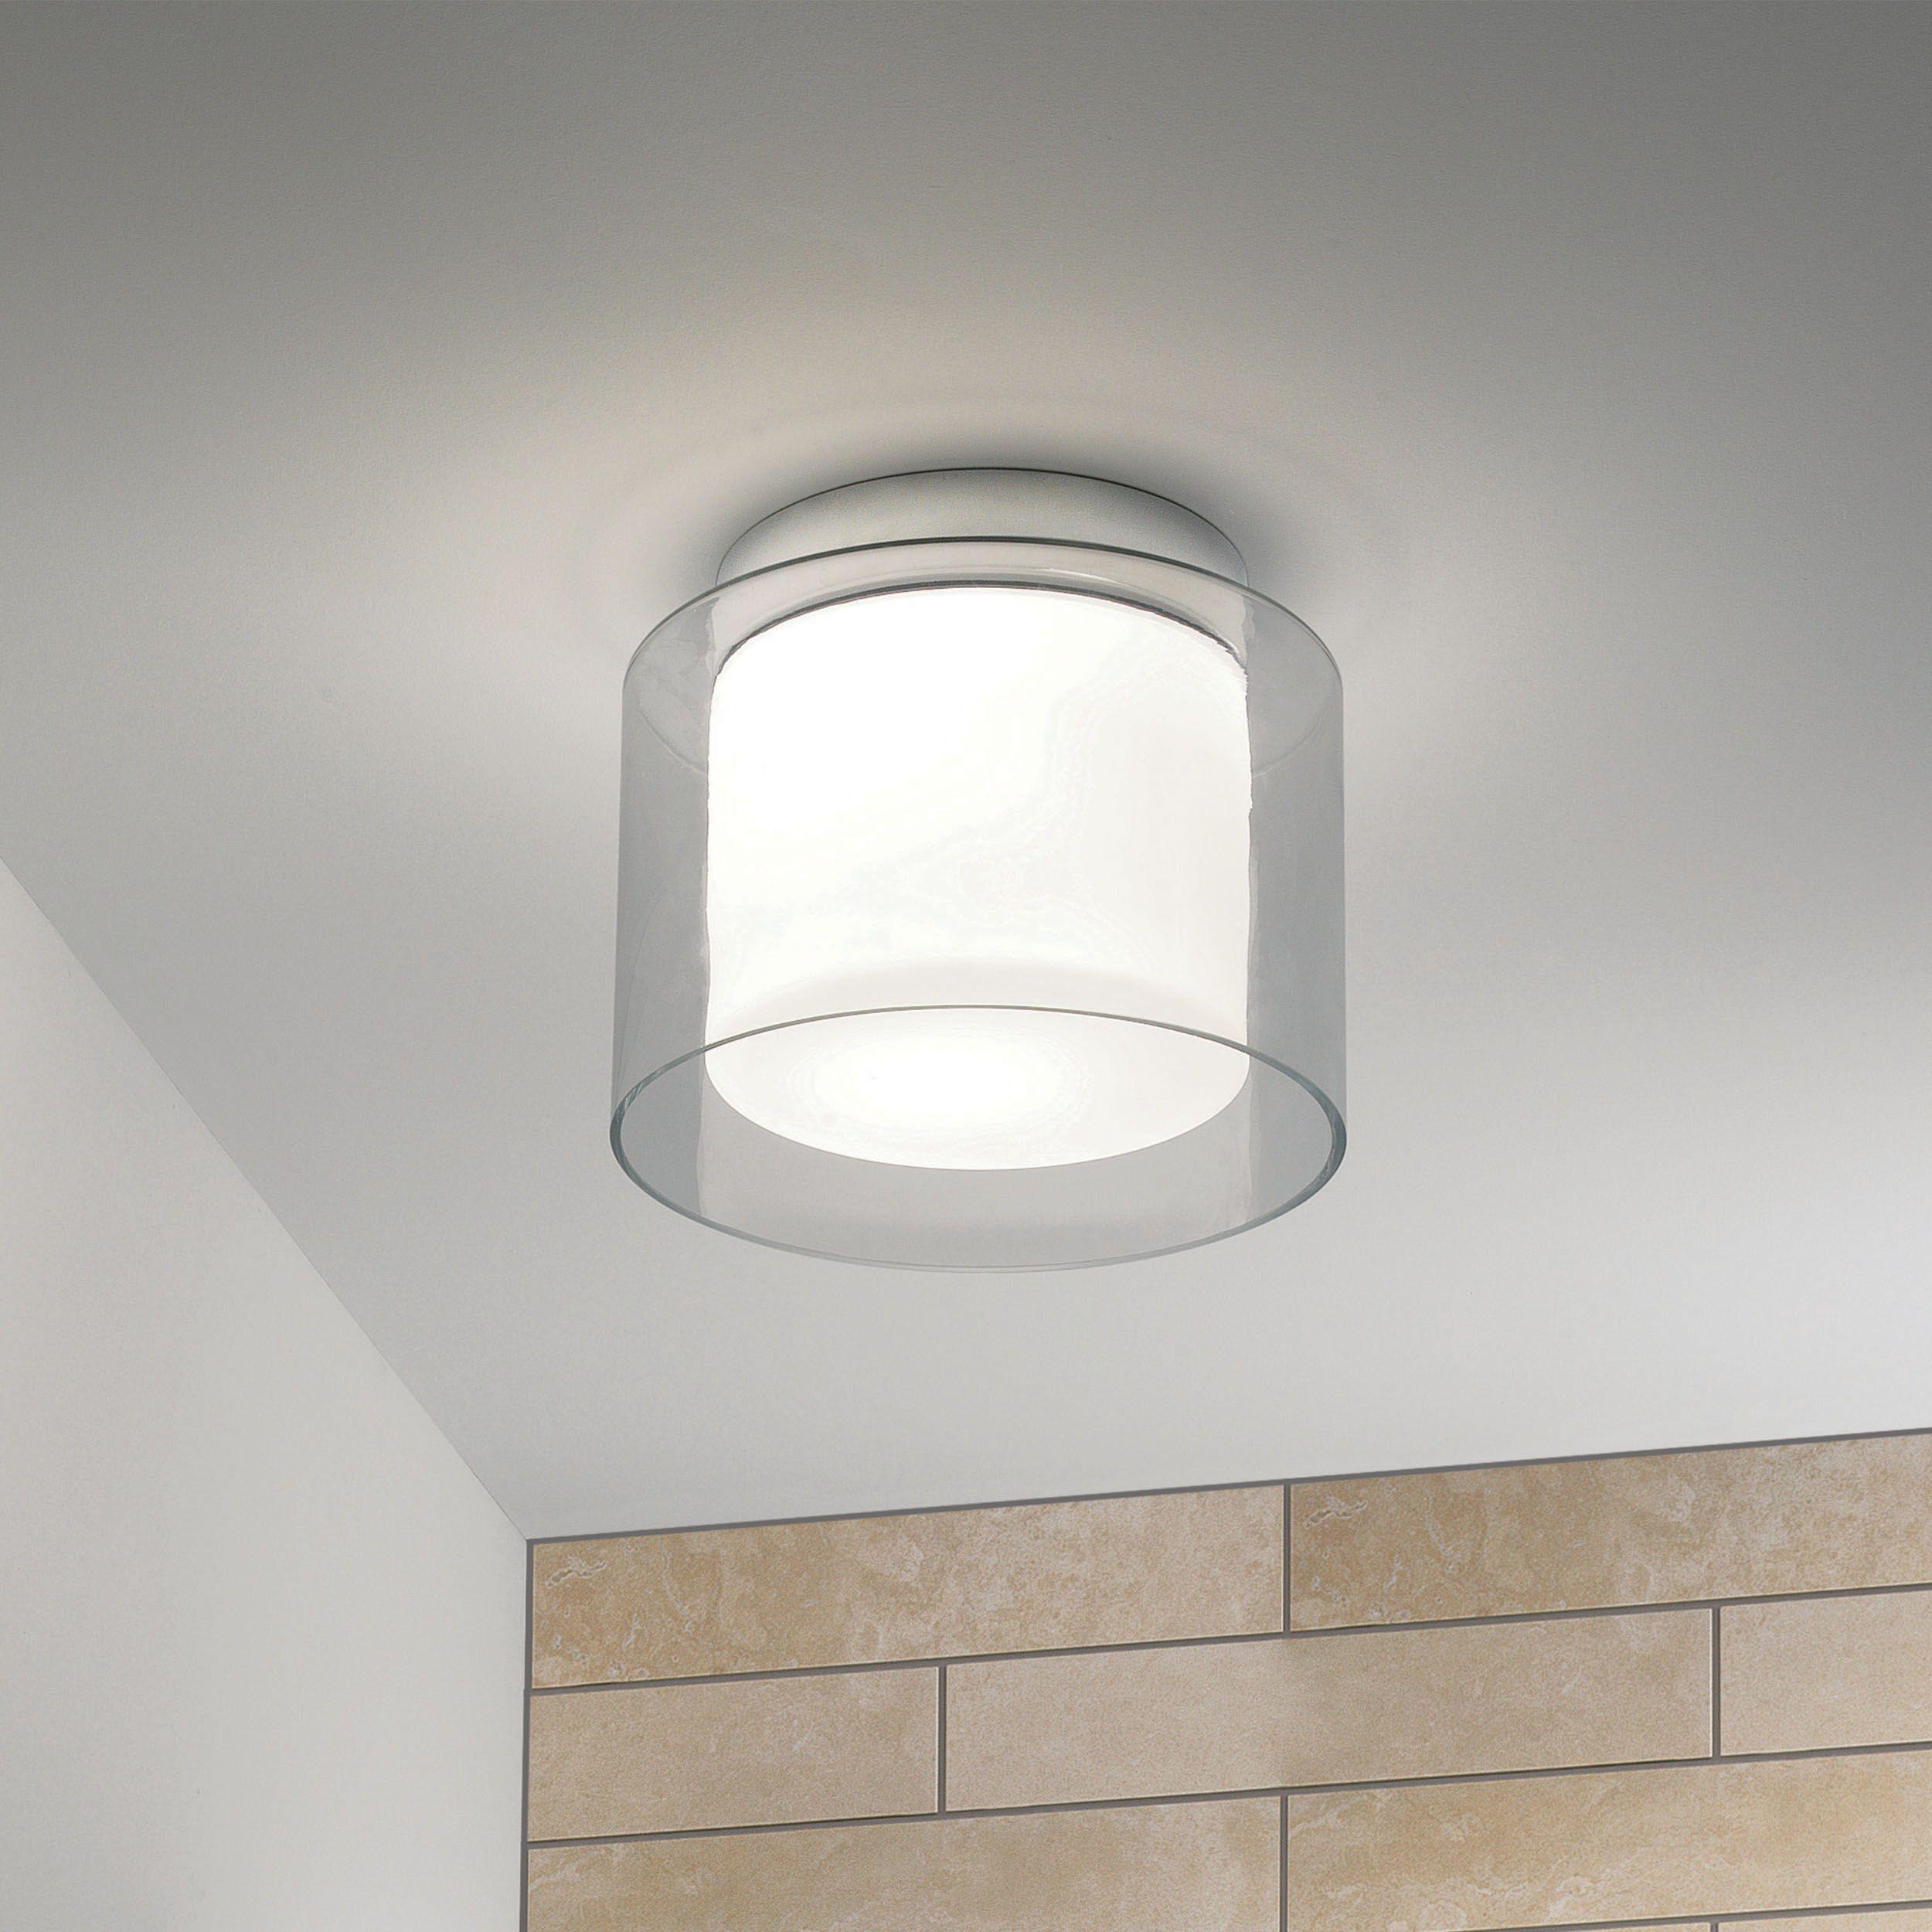 28 Awesome Bathroom Ceiling Lights Bathroom Ceiling Light Flush Ceiling Lights Uk Ceiling Lights